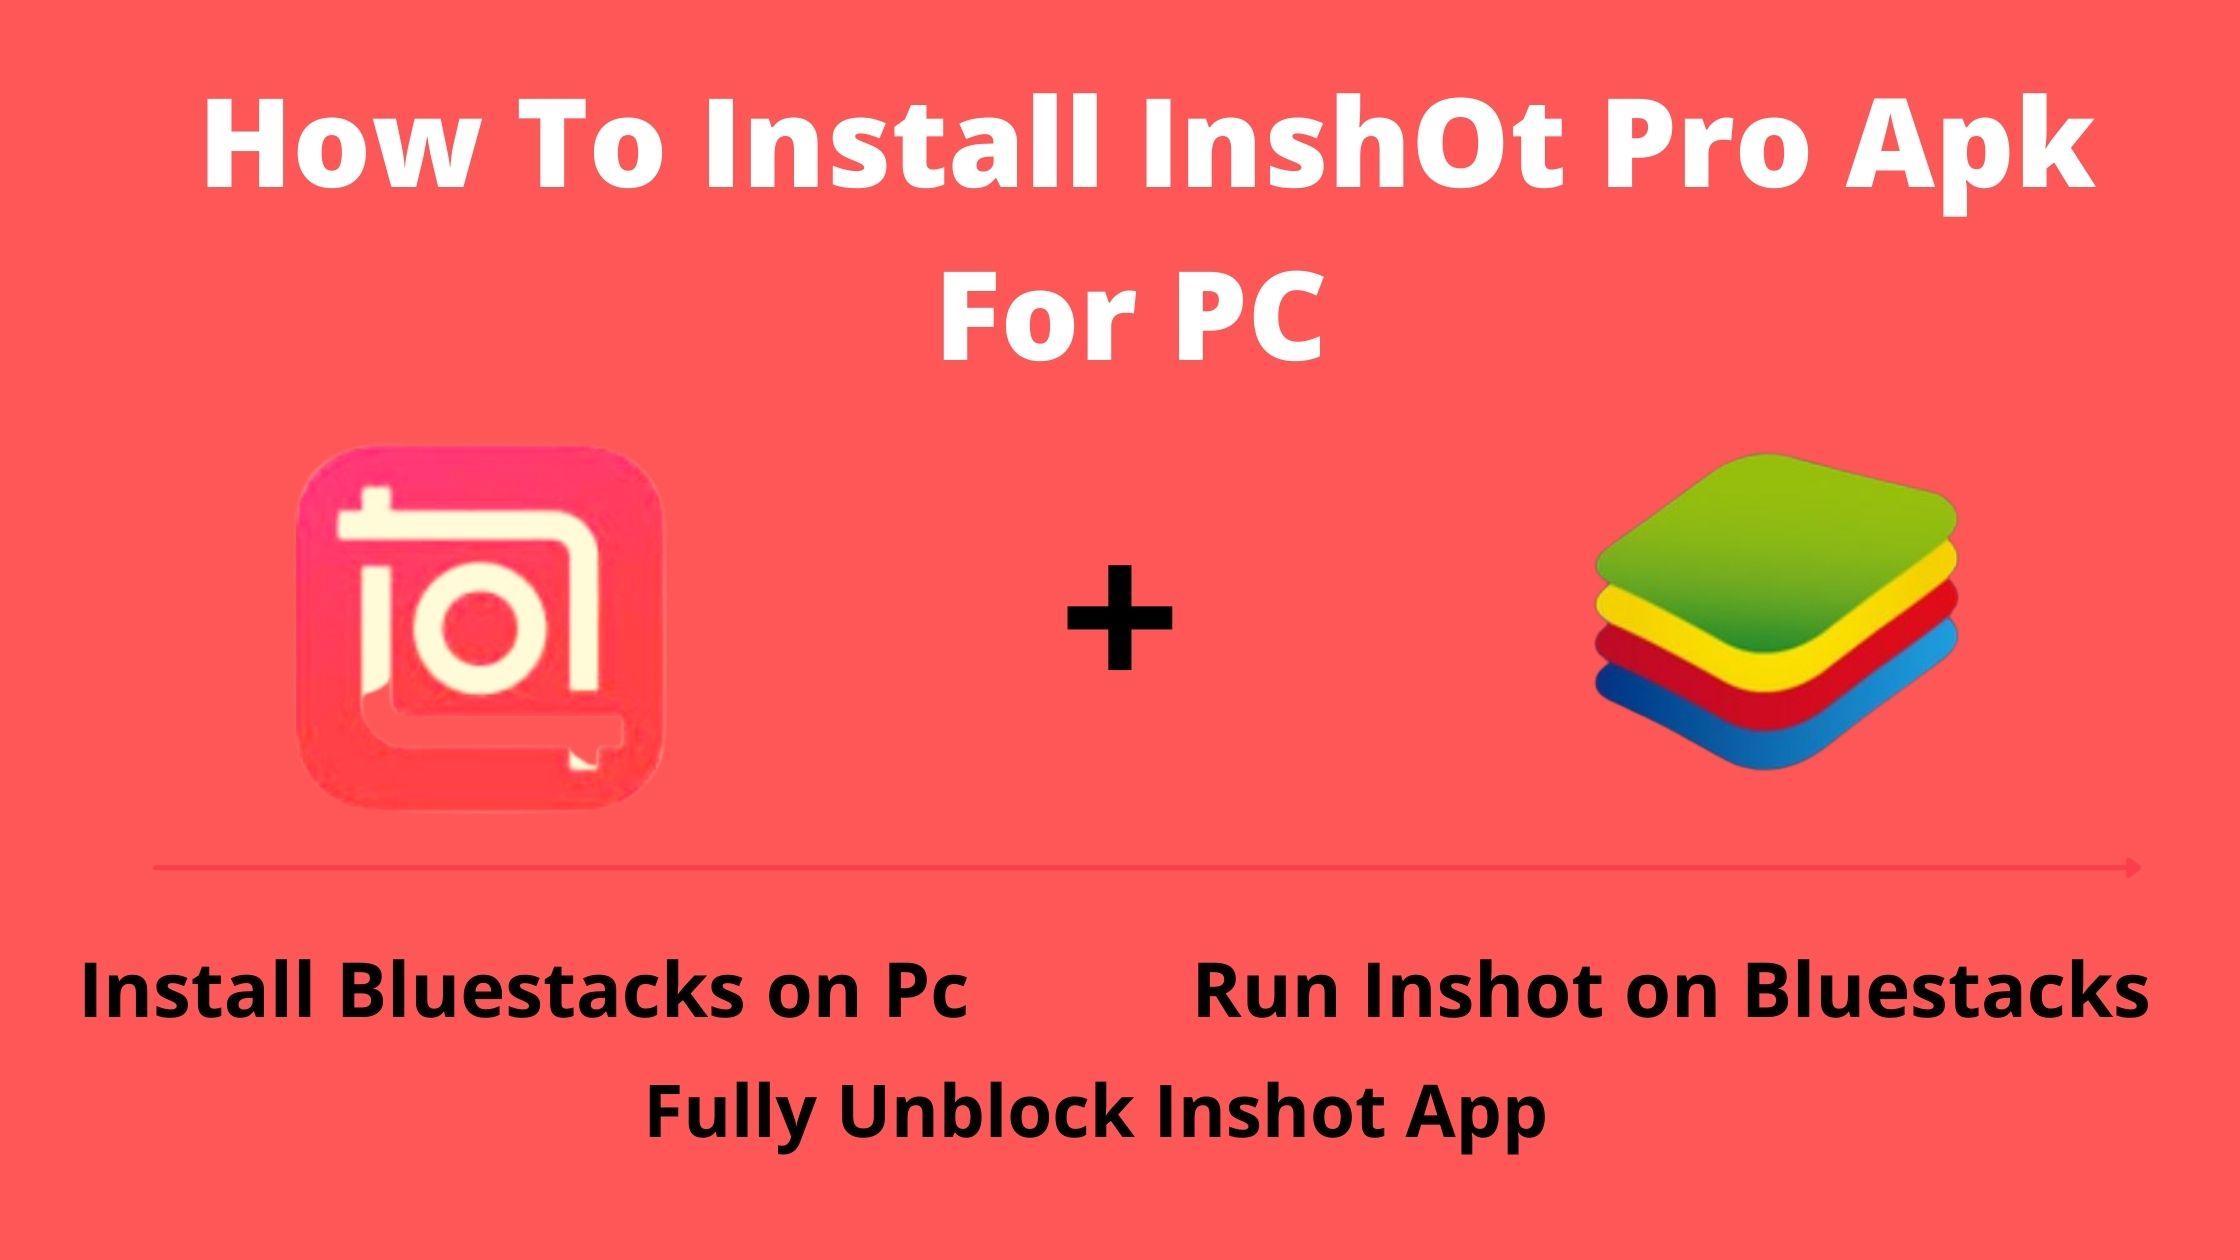 inshot pro apk for pc